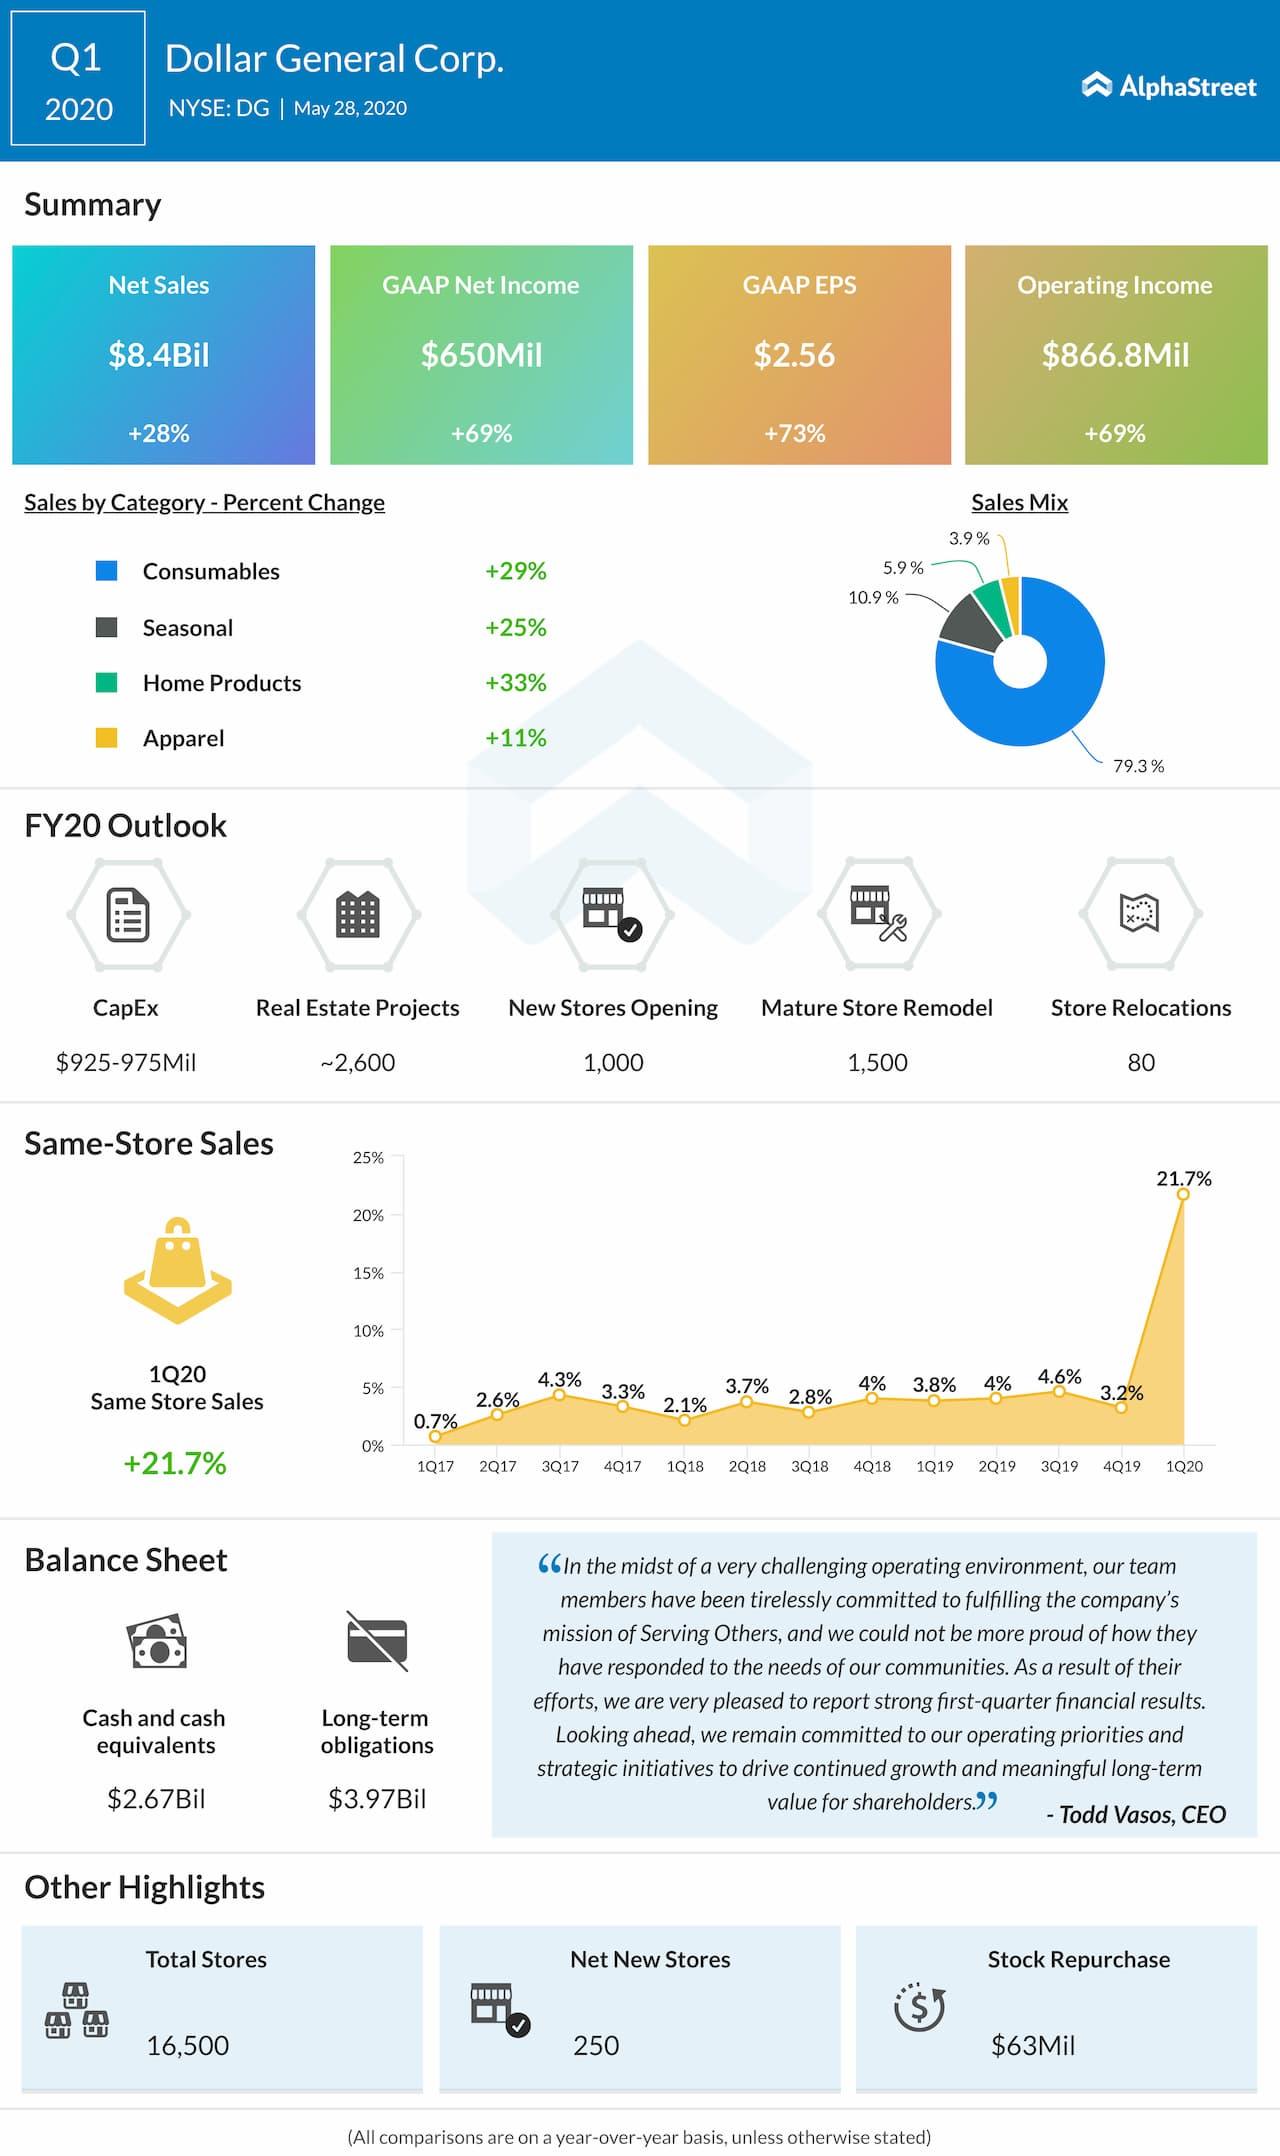 Dollar General (DG) Q1 2020 earnings review